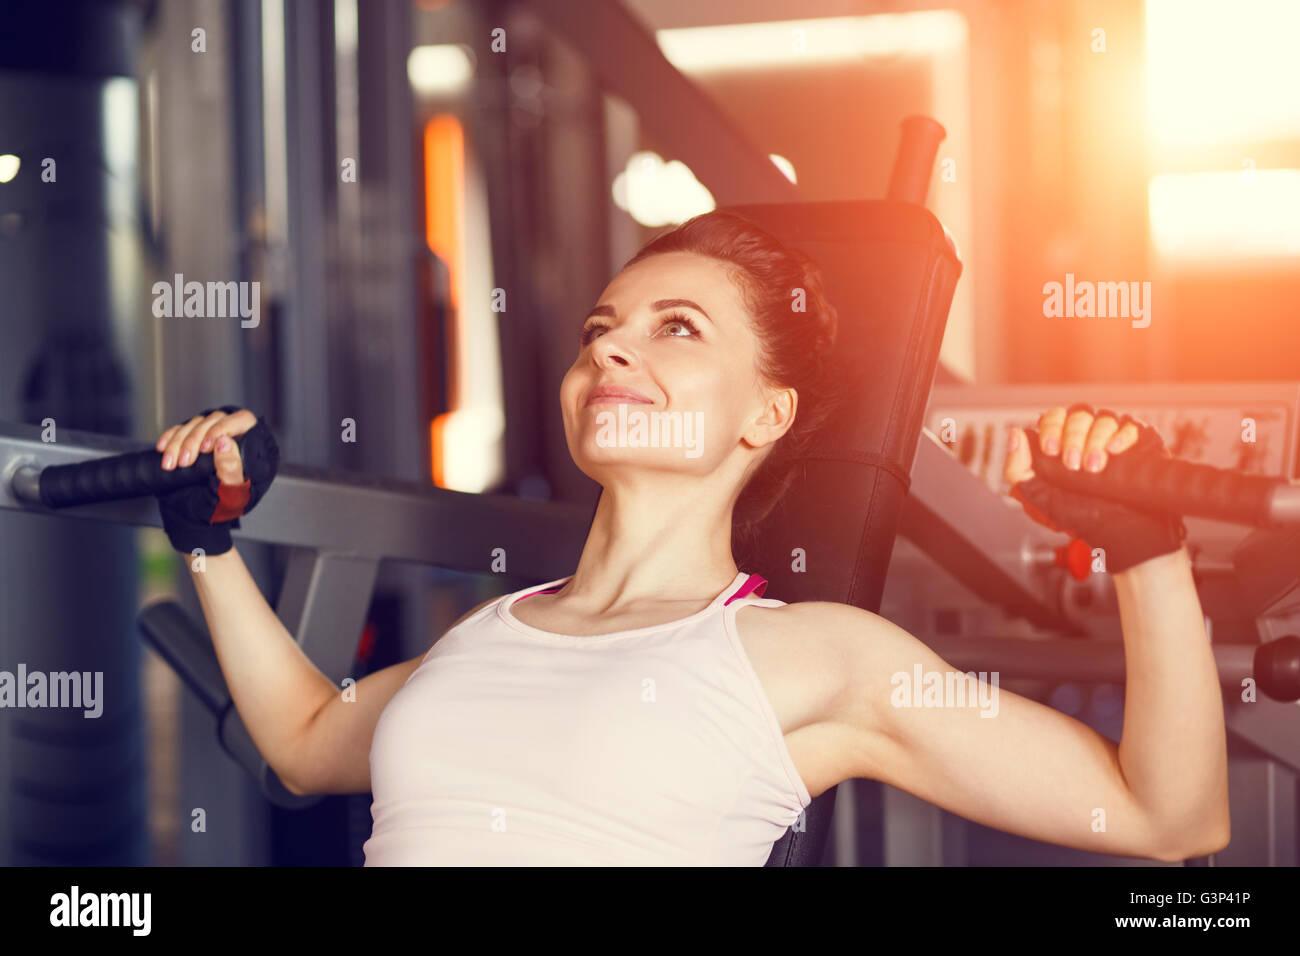 Junge lächelnde Frau Brust fliegen Sport im Fitness-Studio-Maschine. Stockbild